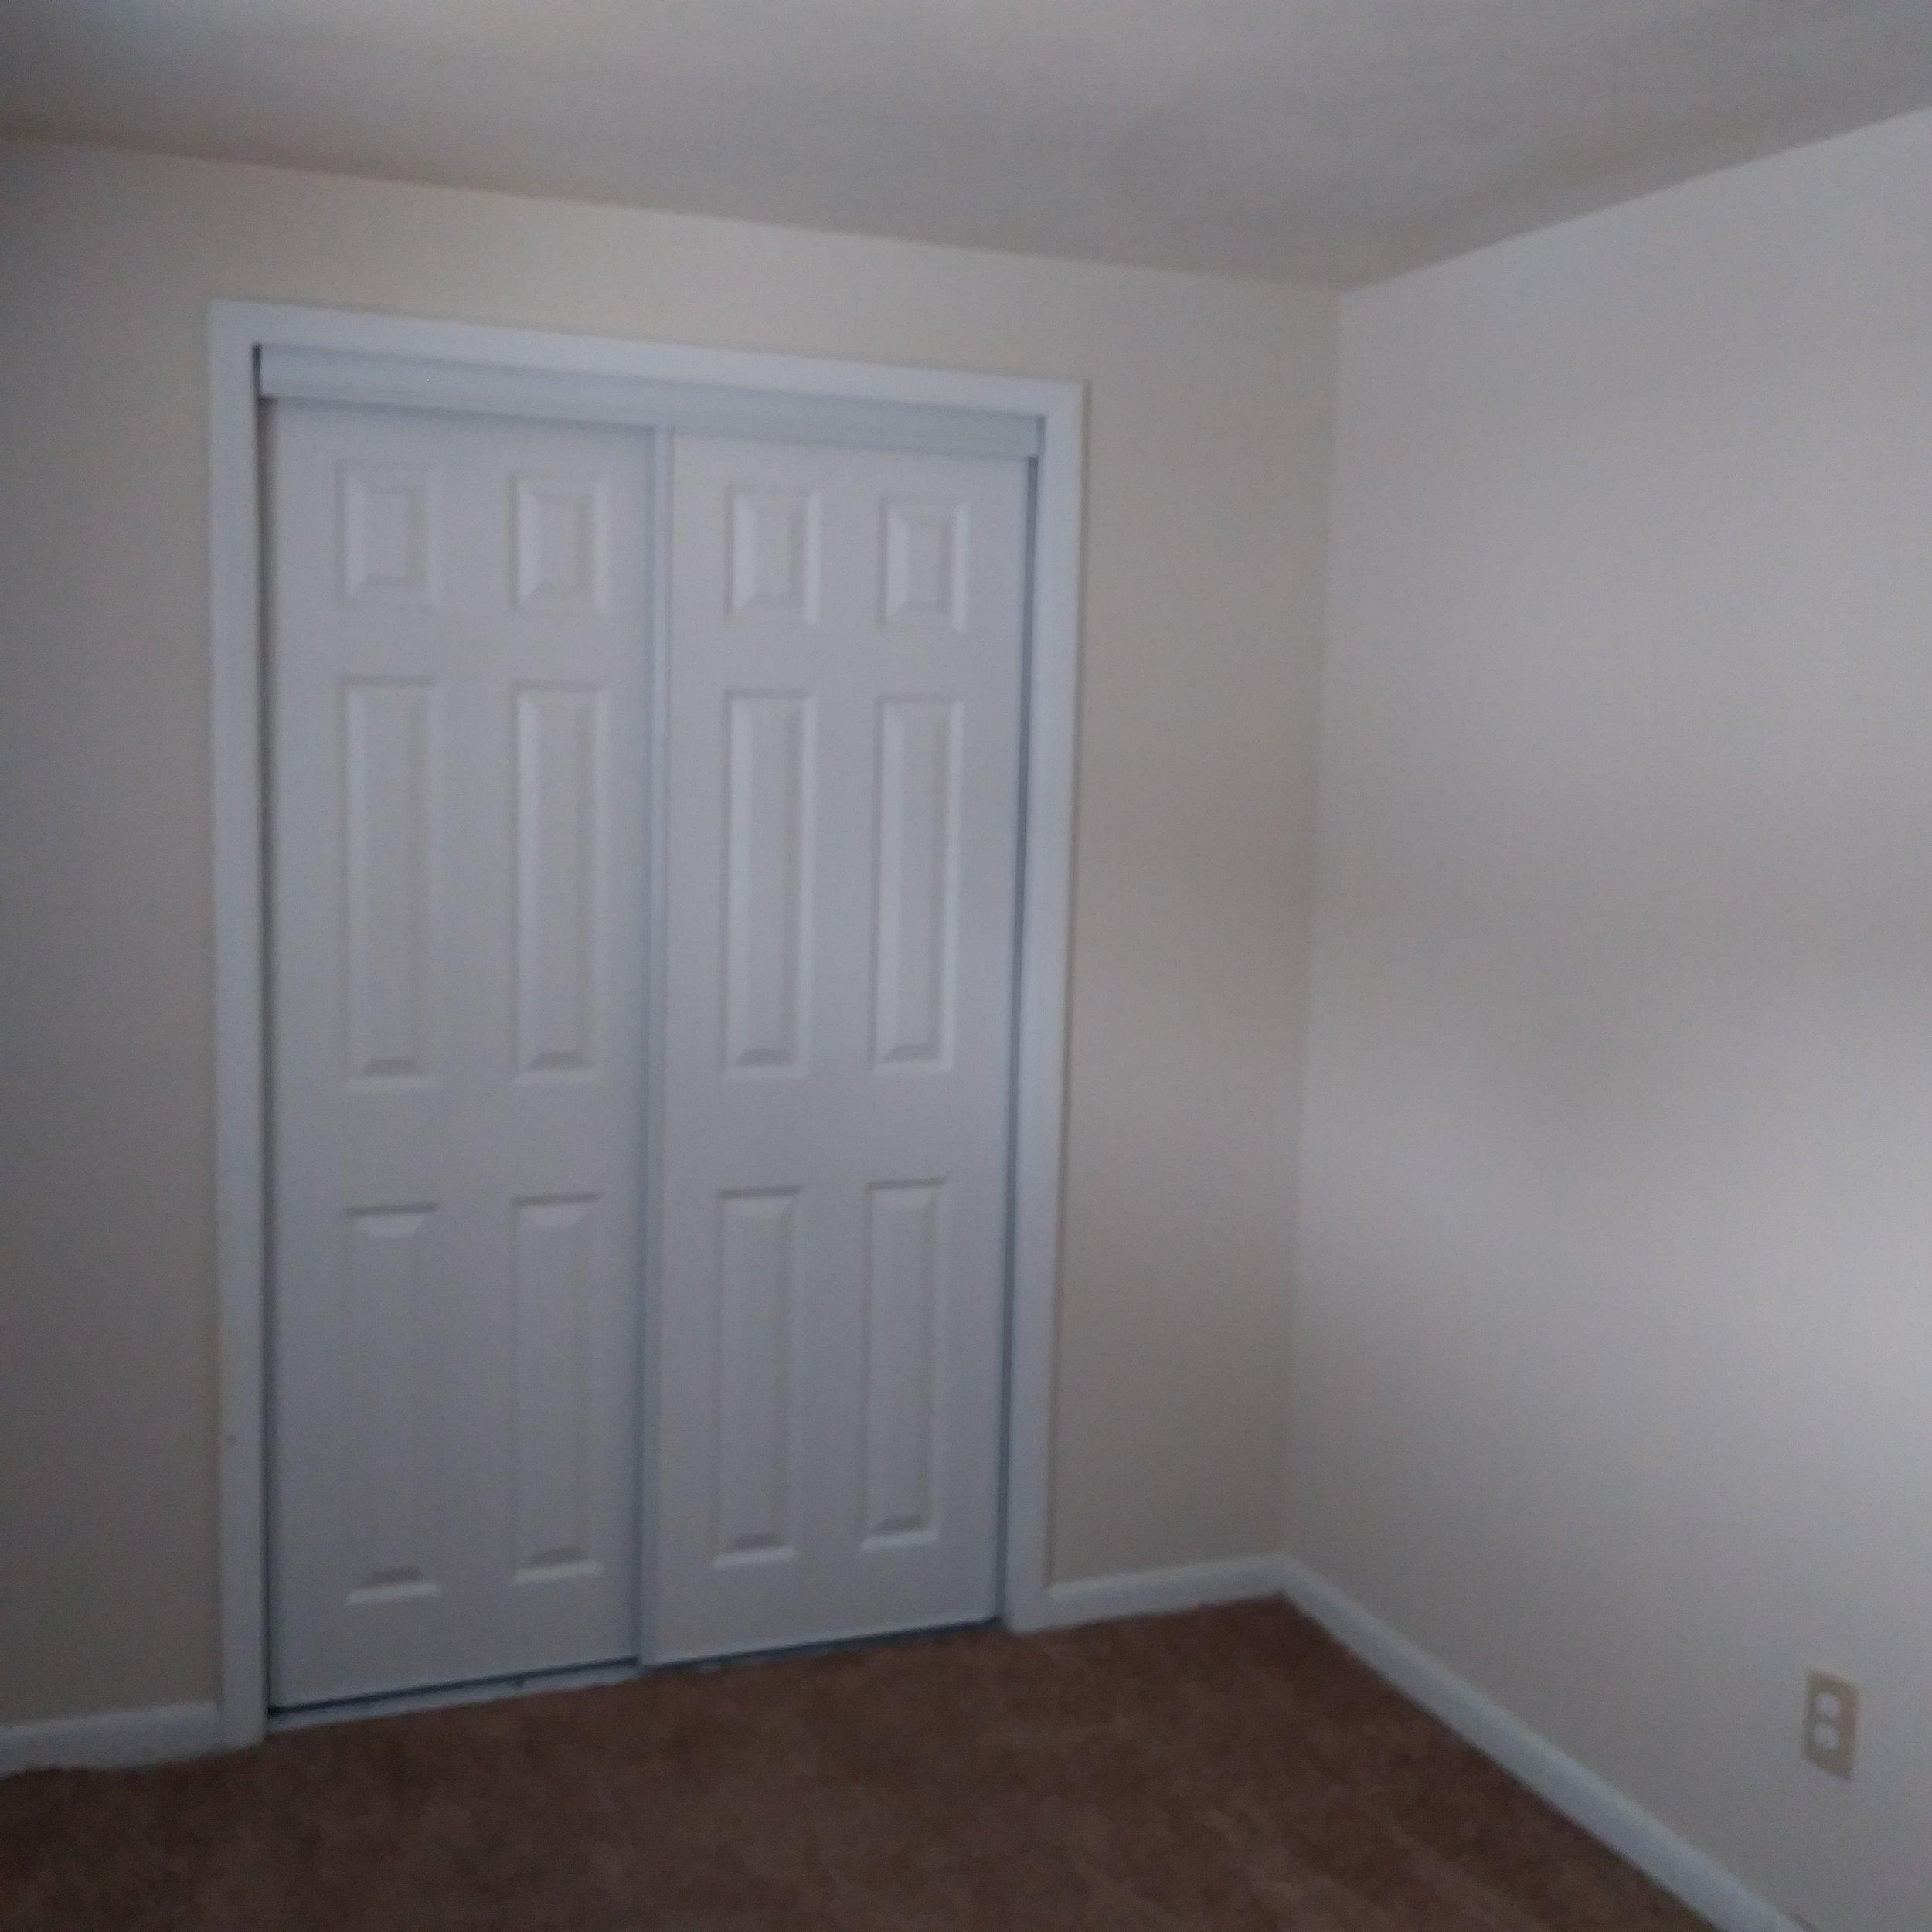 Graham Street, S., 119 - Bedroom.jpg